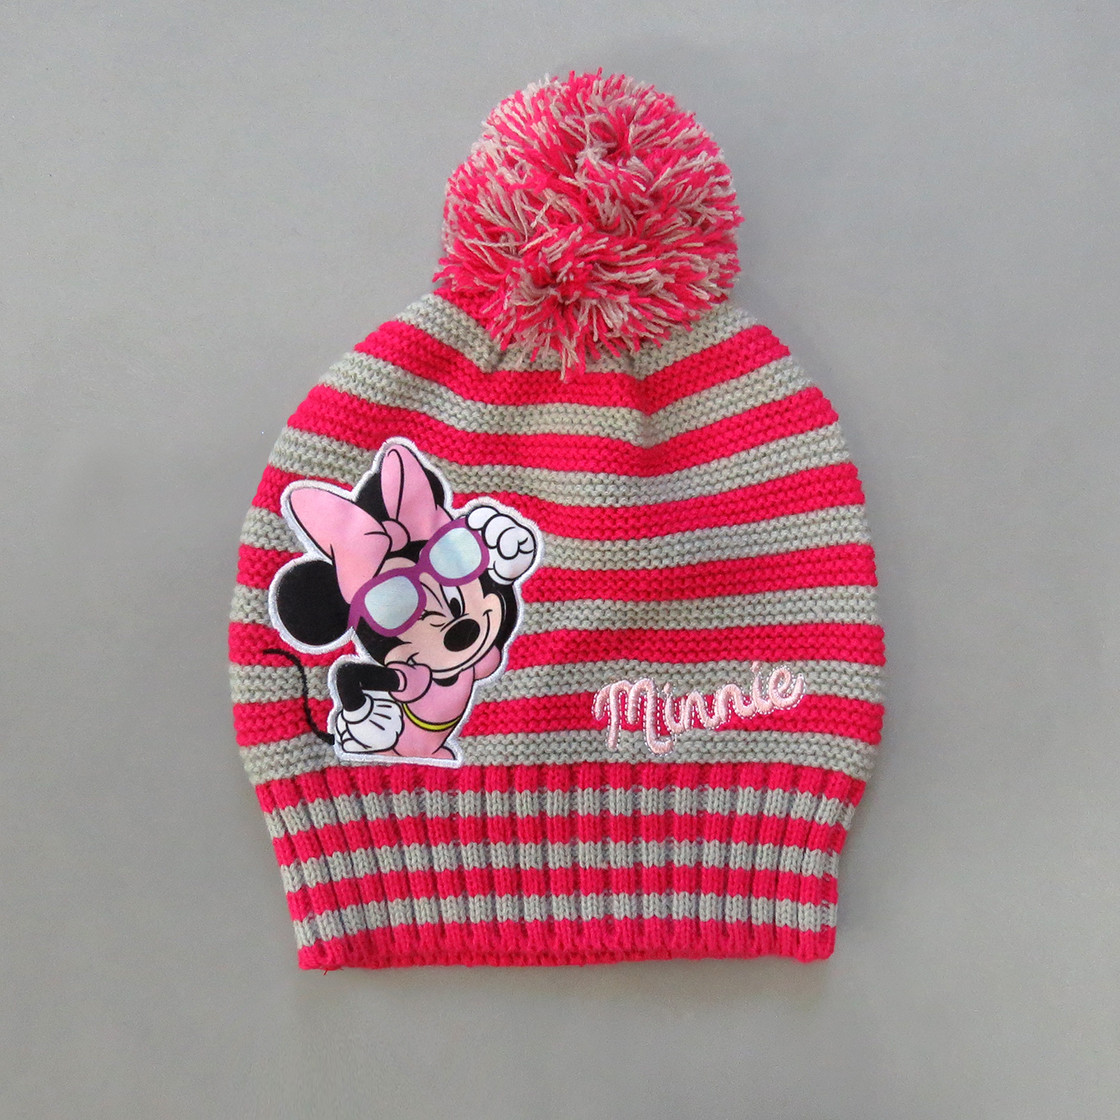 Шапка Minnie Mouse для девочки.